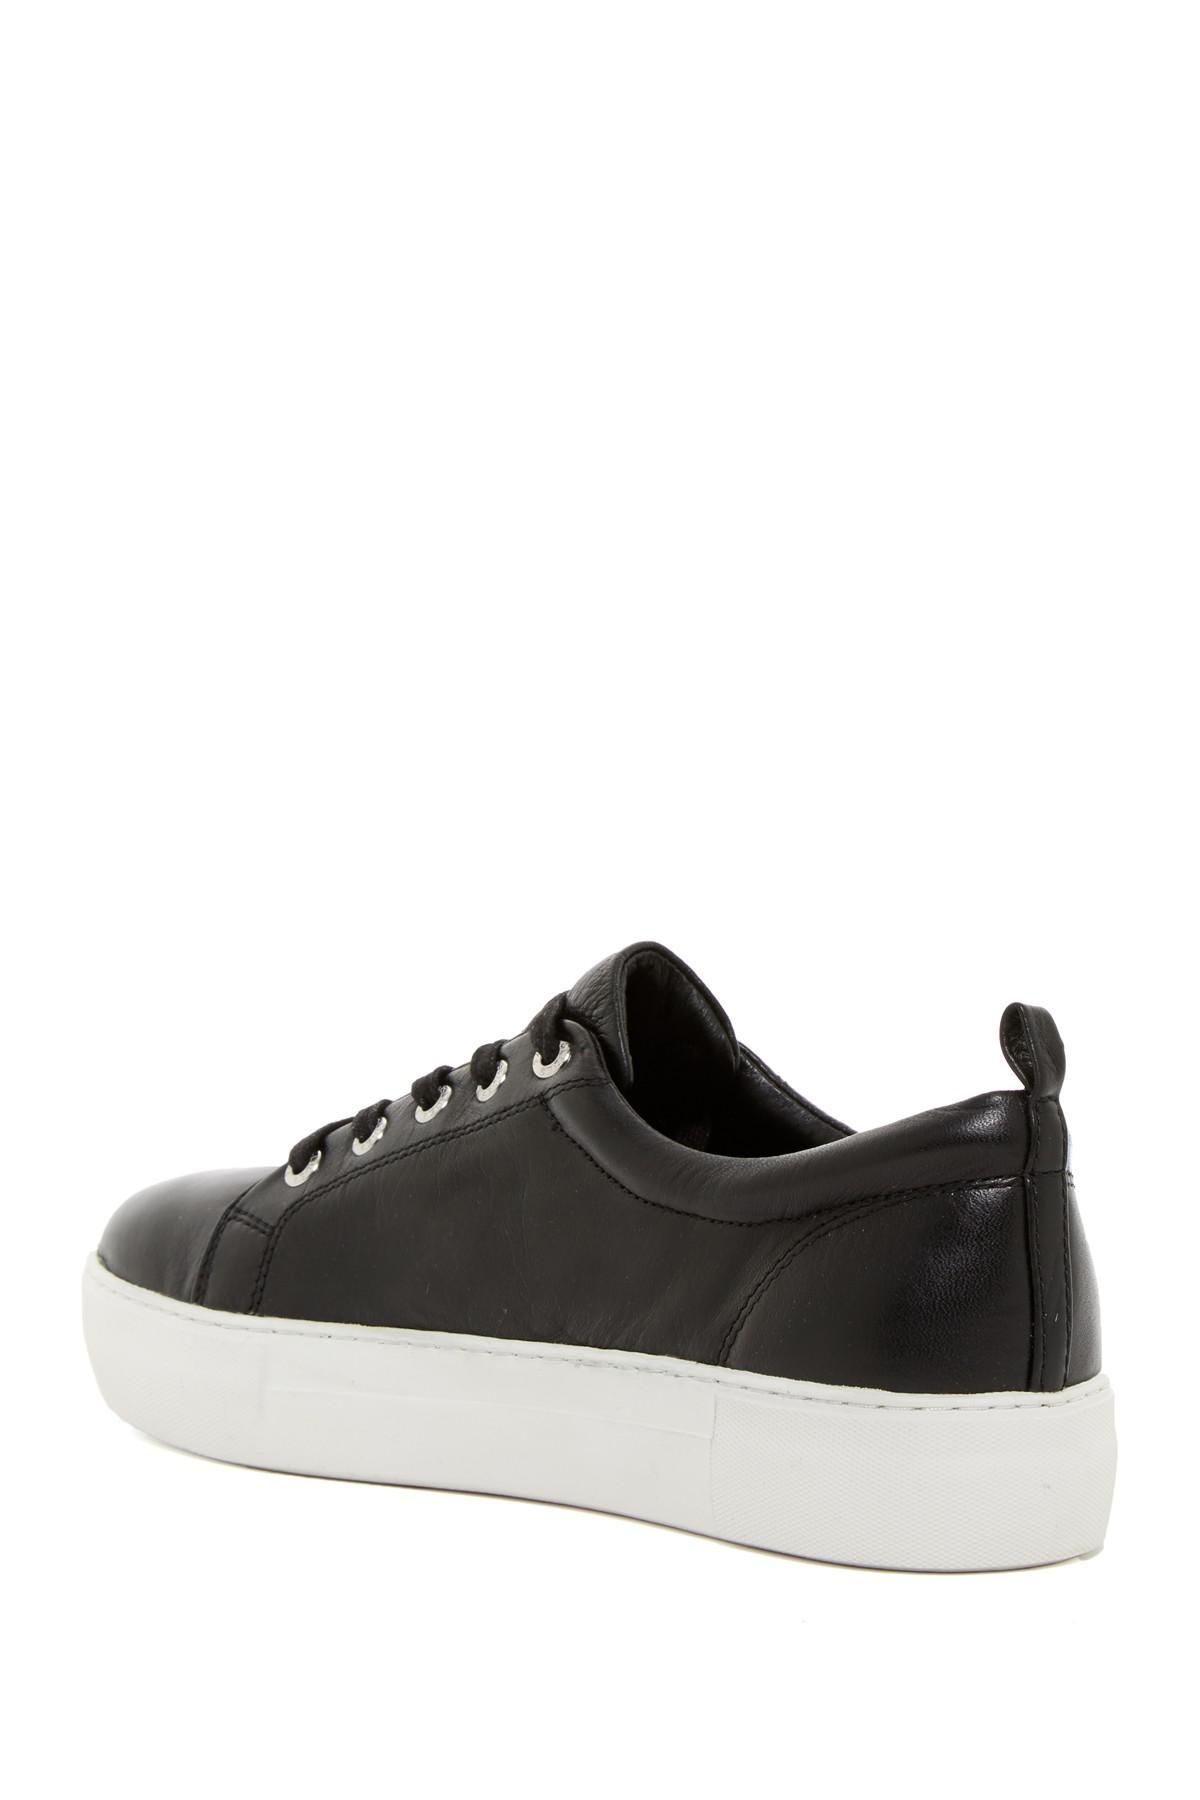 J/Slides Ambrosia Studded Leather Sneaker joVDqaiO